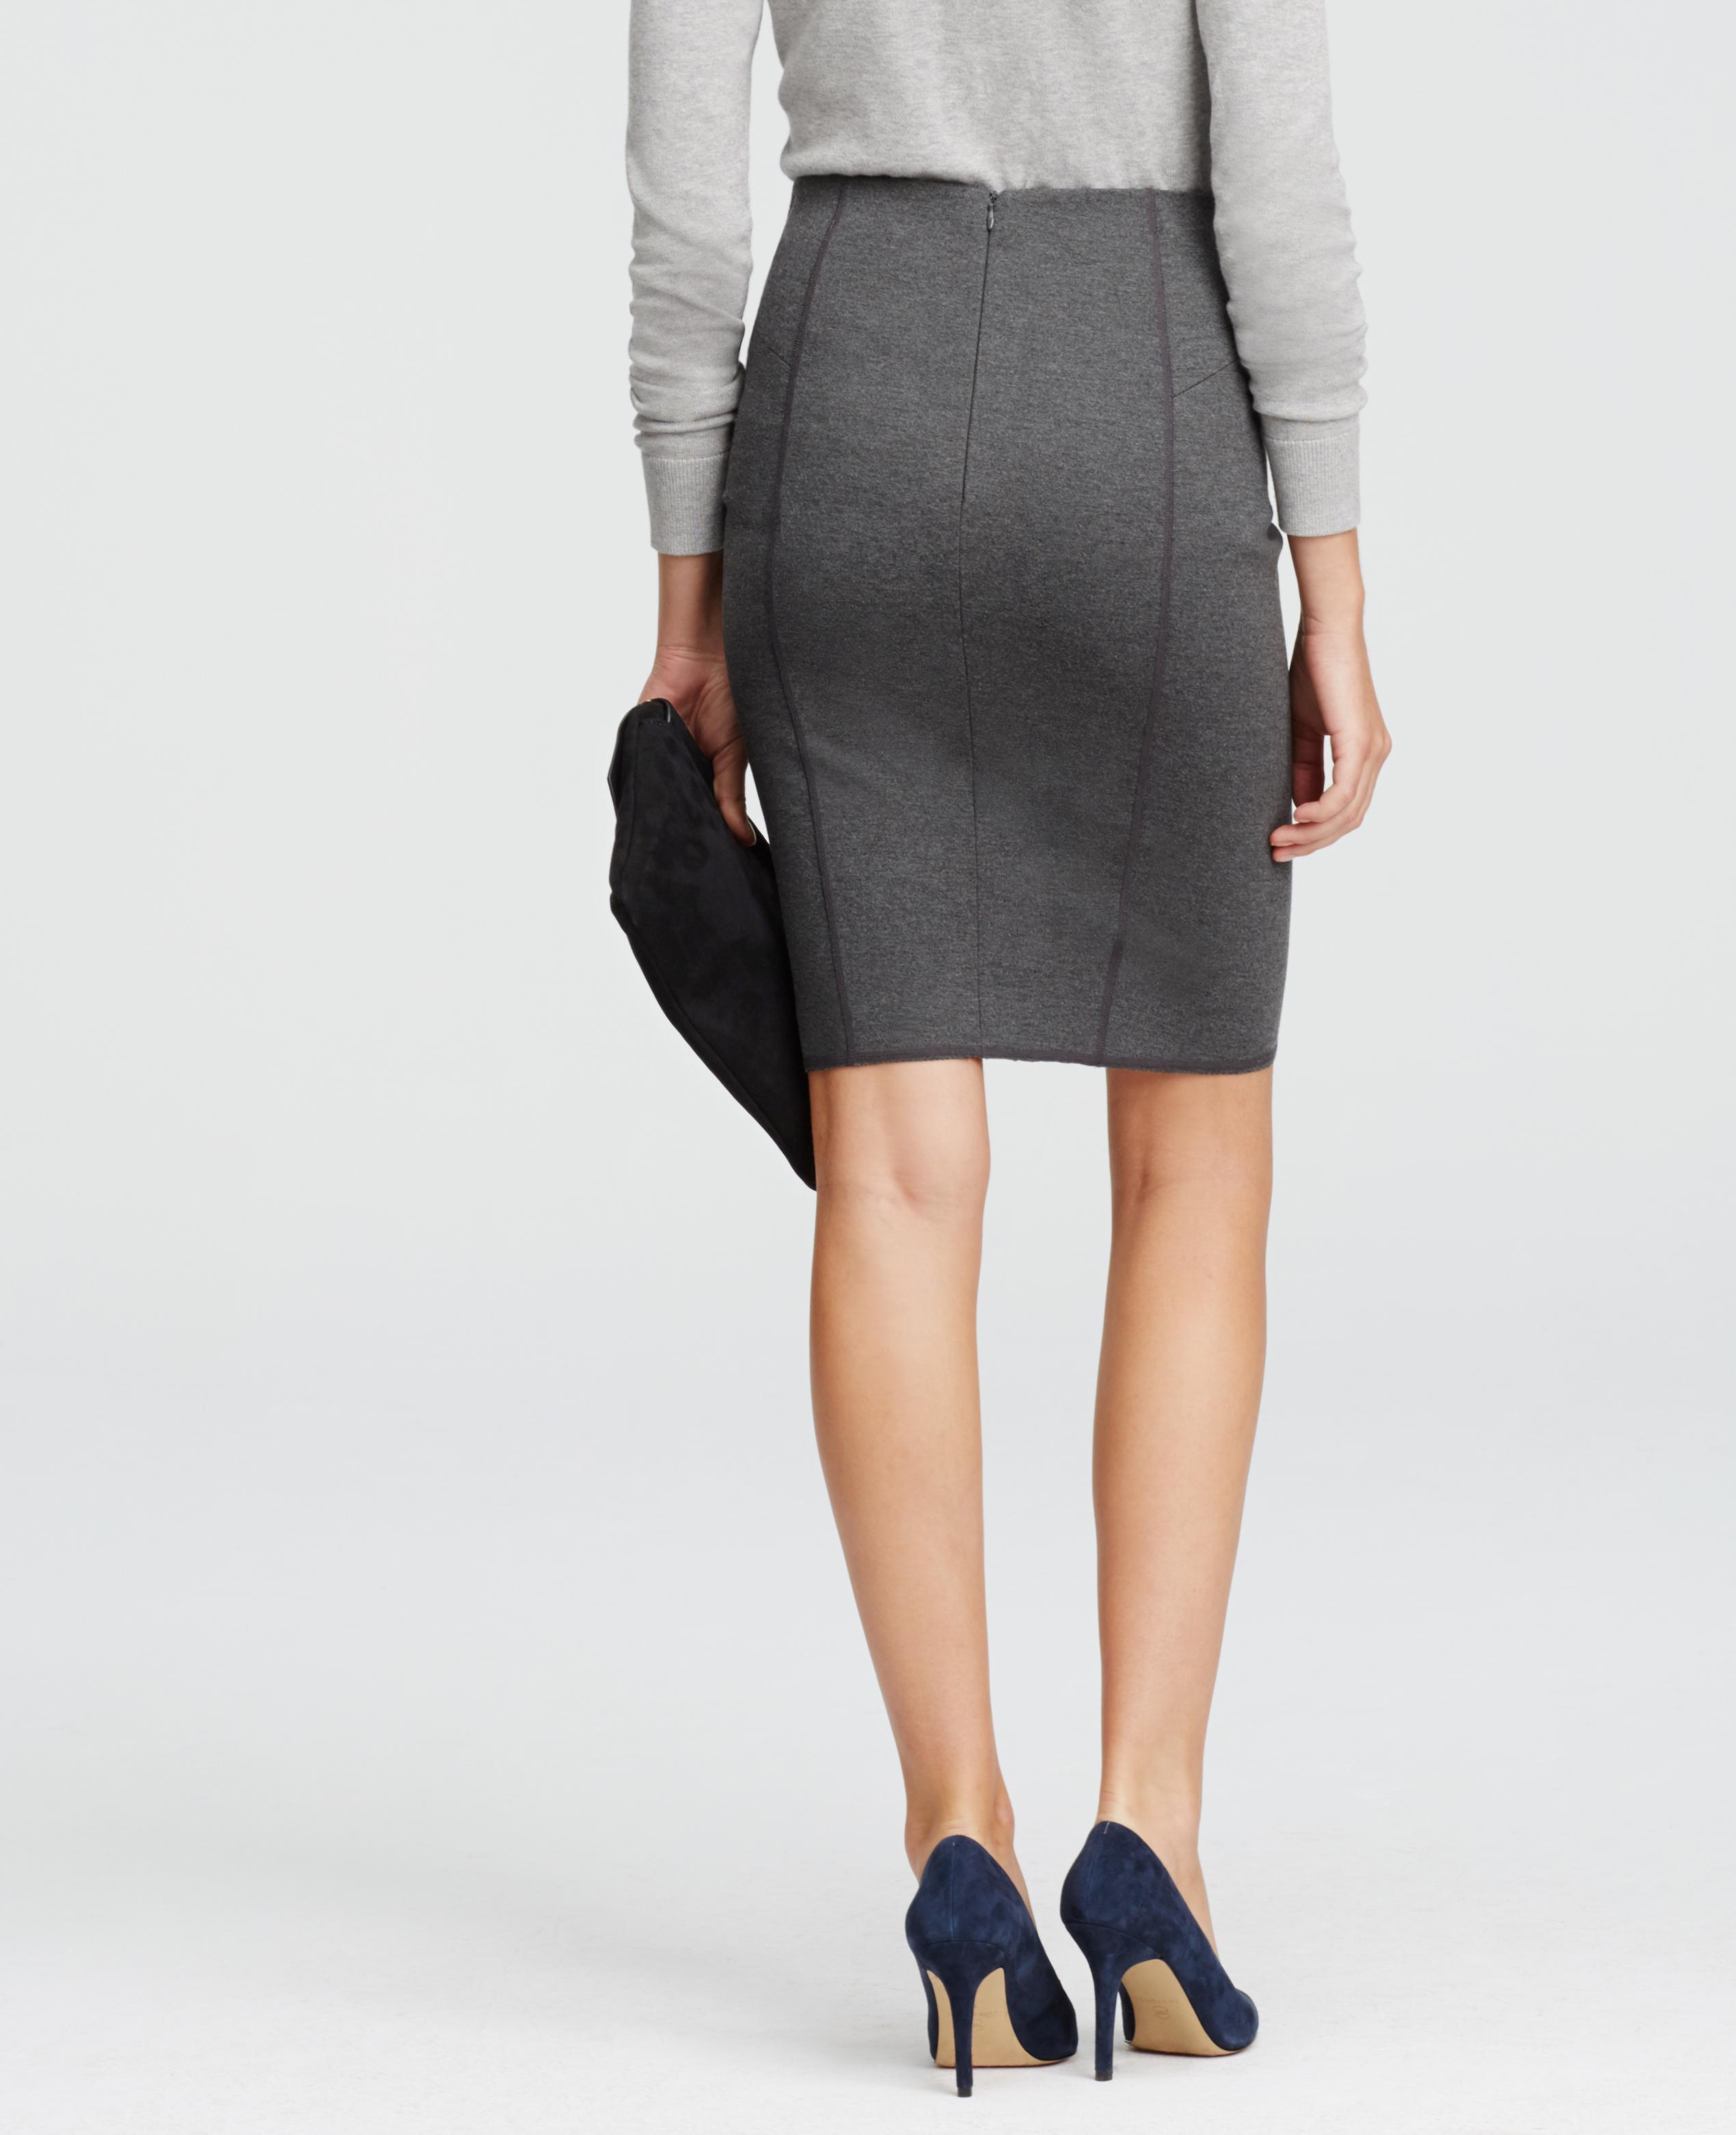 Ann taylor Ponte Pencil Skirt in Gray | Lyst